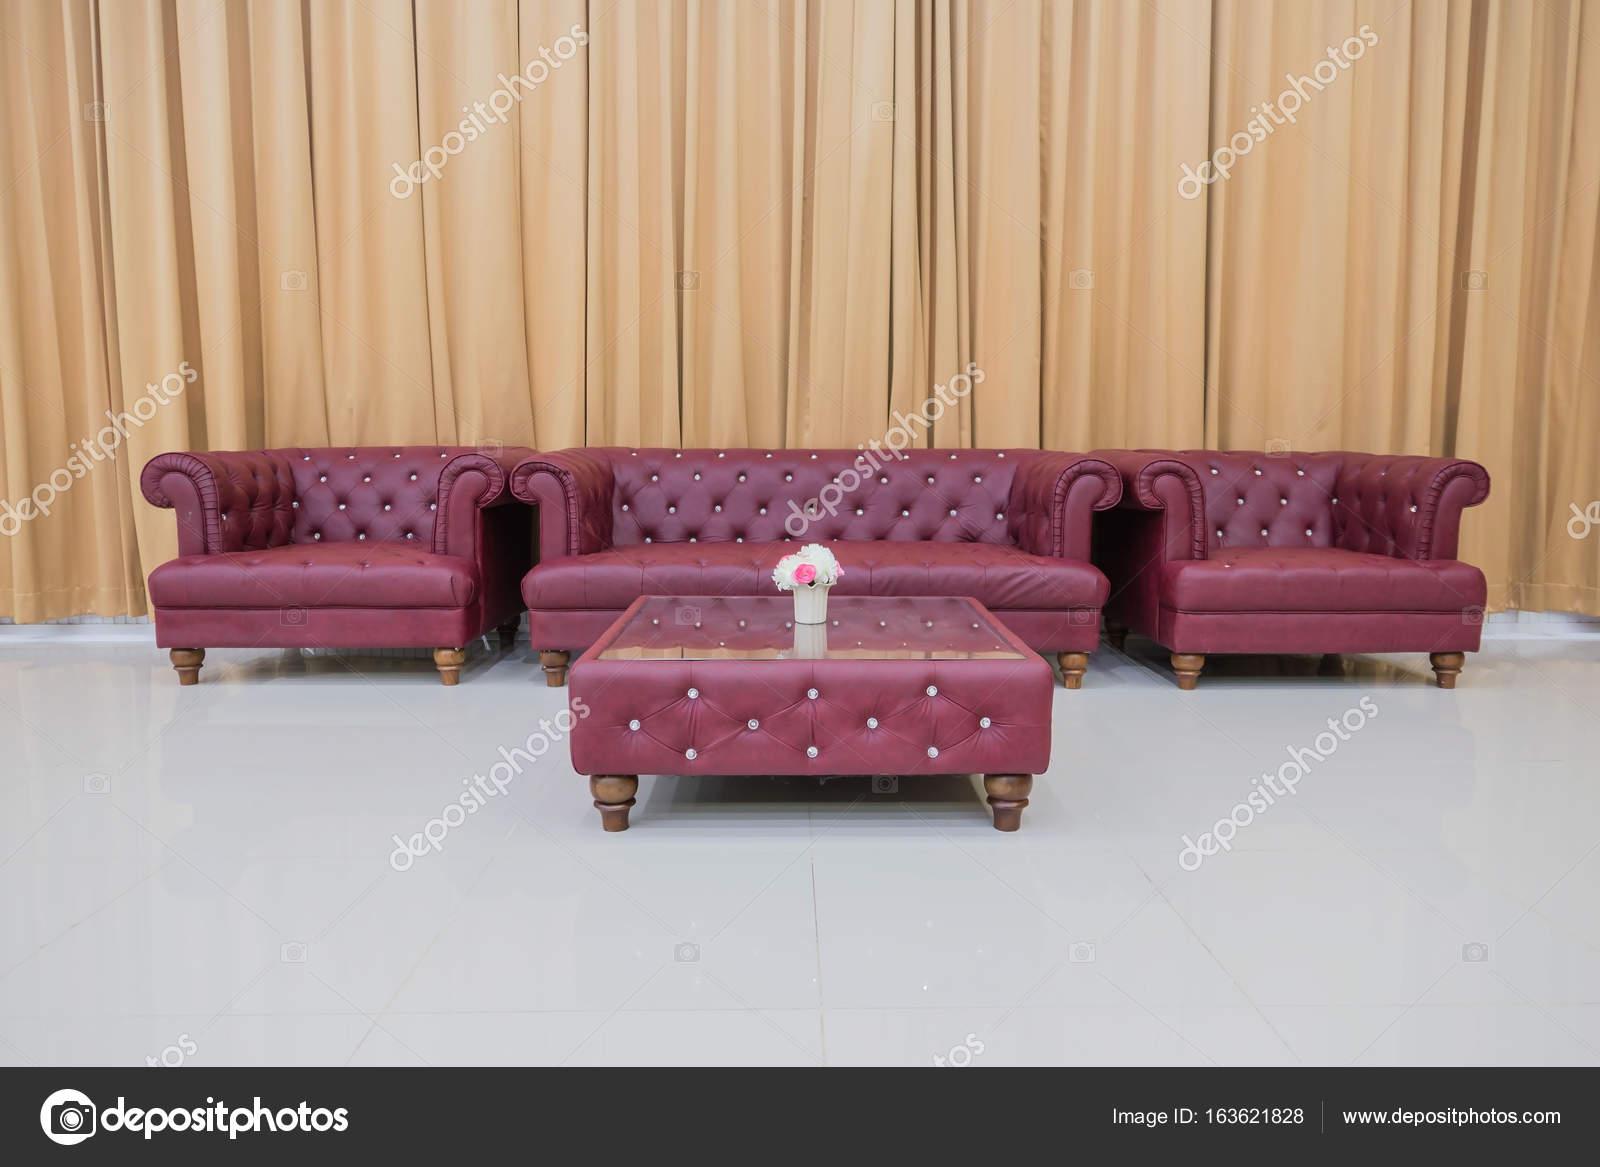 rode sofa en gele gordijnen achtergrond instellen stockfoto